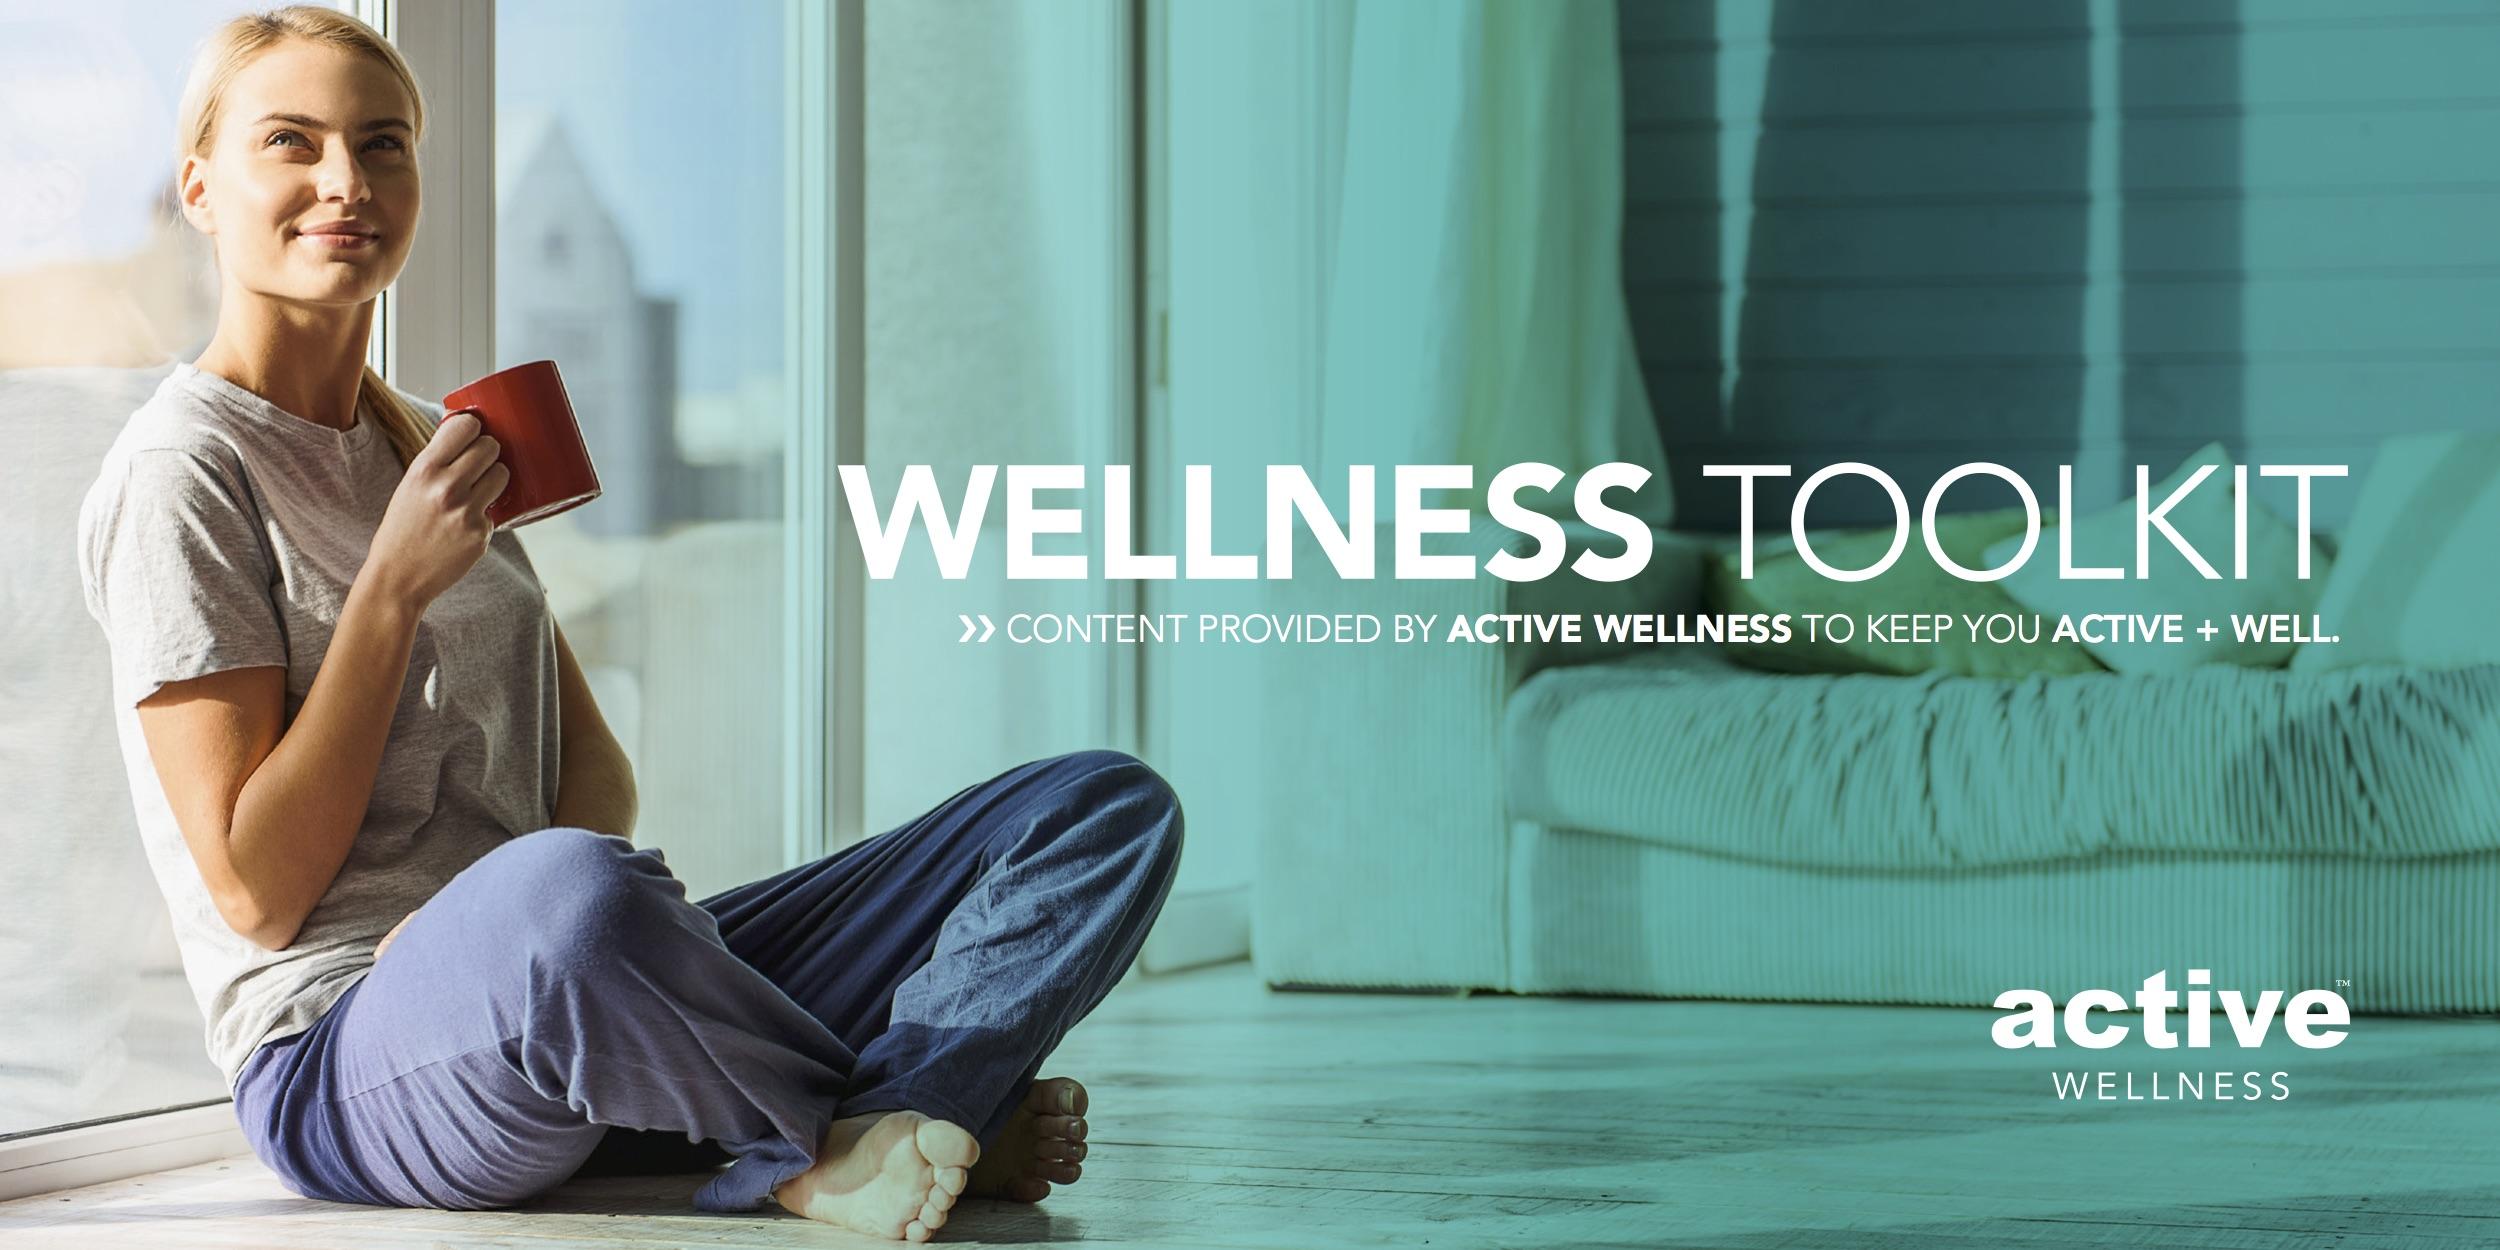 Active Wellness Toolkit